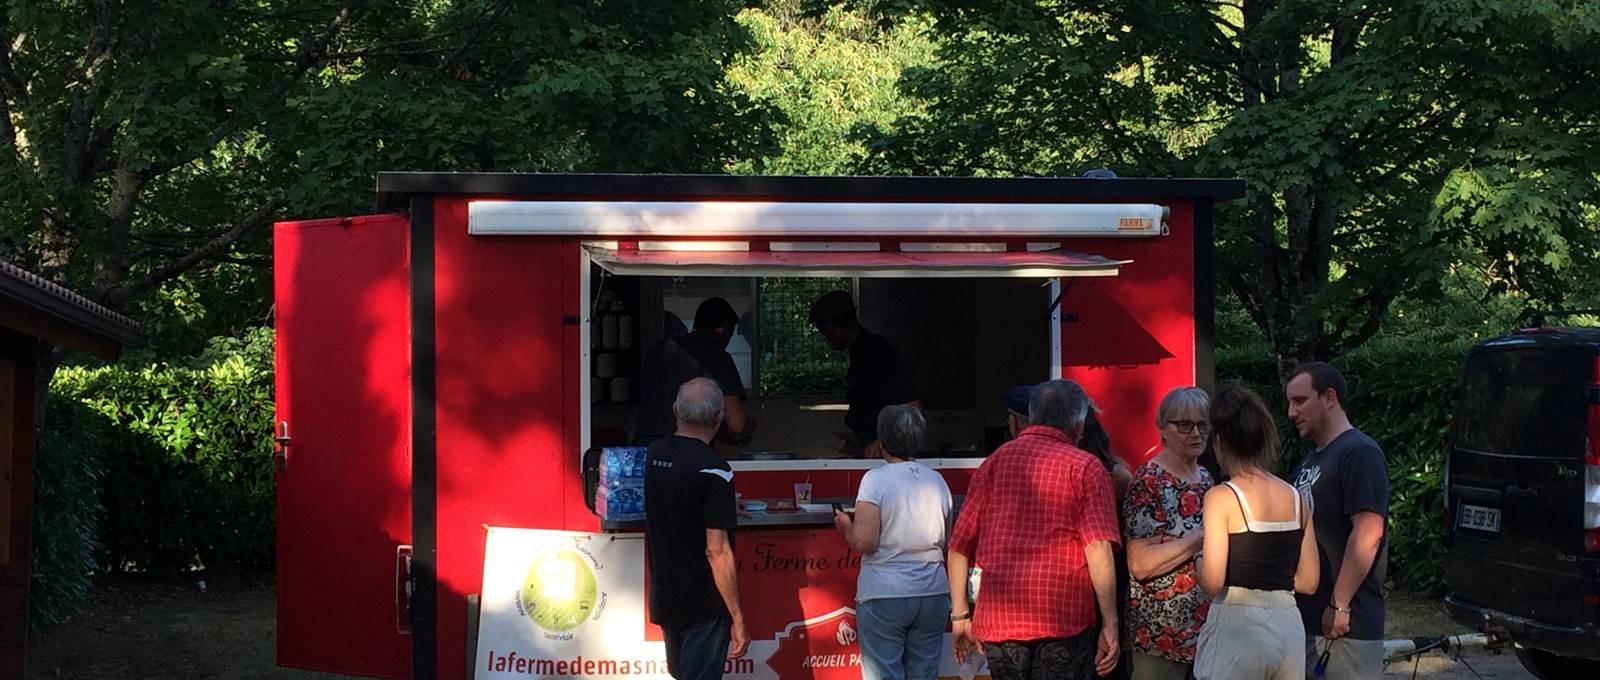 Food truck la ferme des Masnaud - Camping de la Lande - Nexon